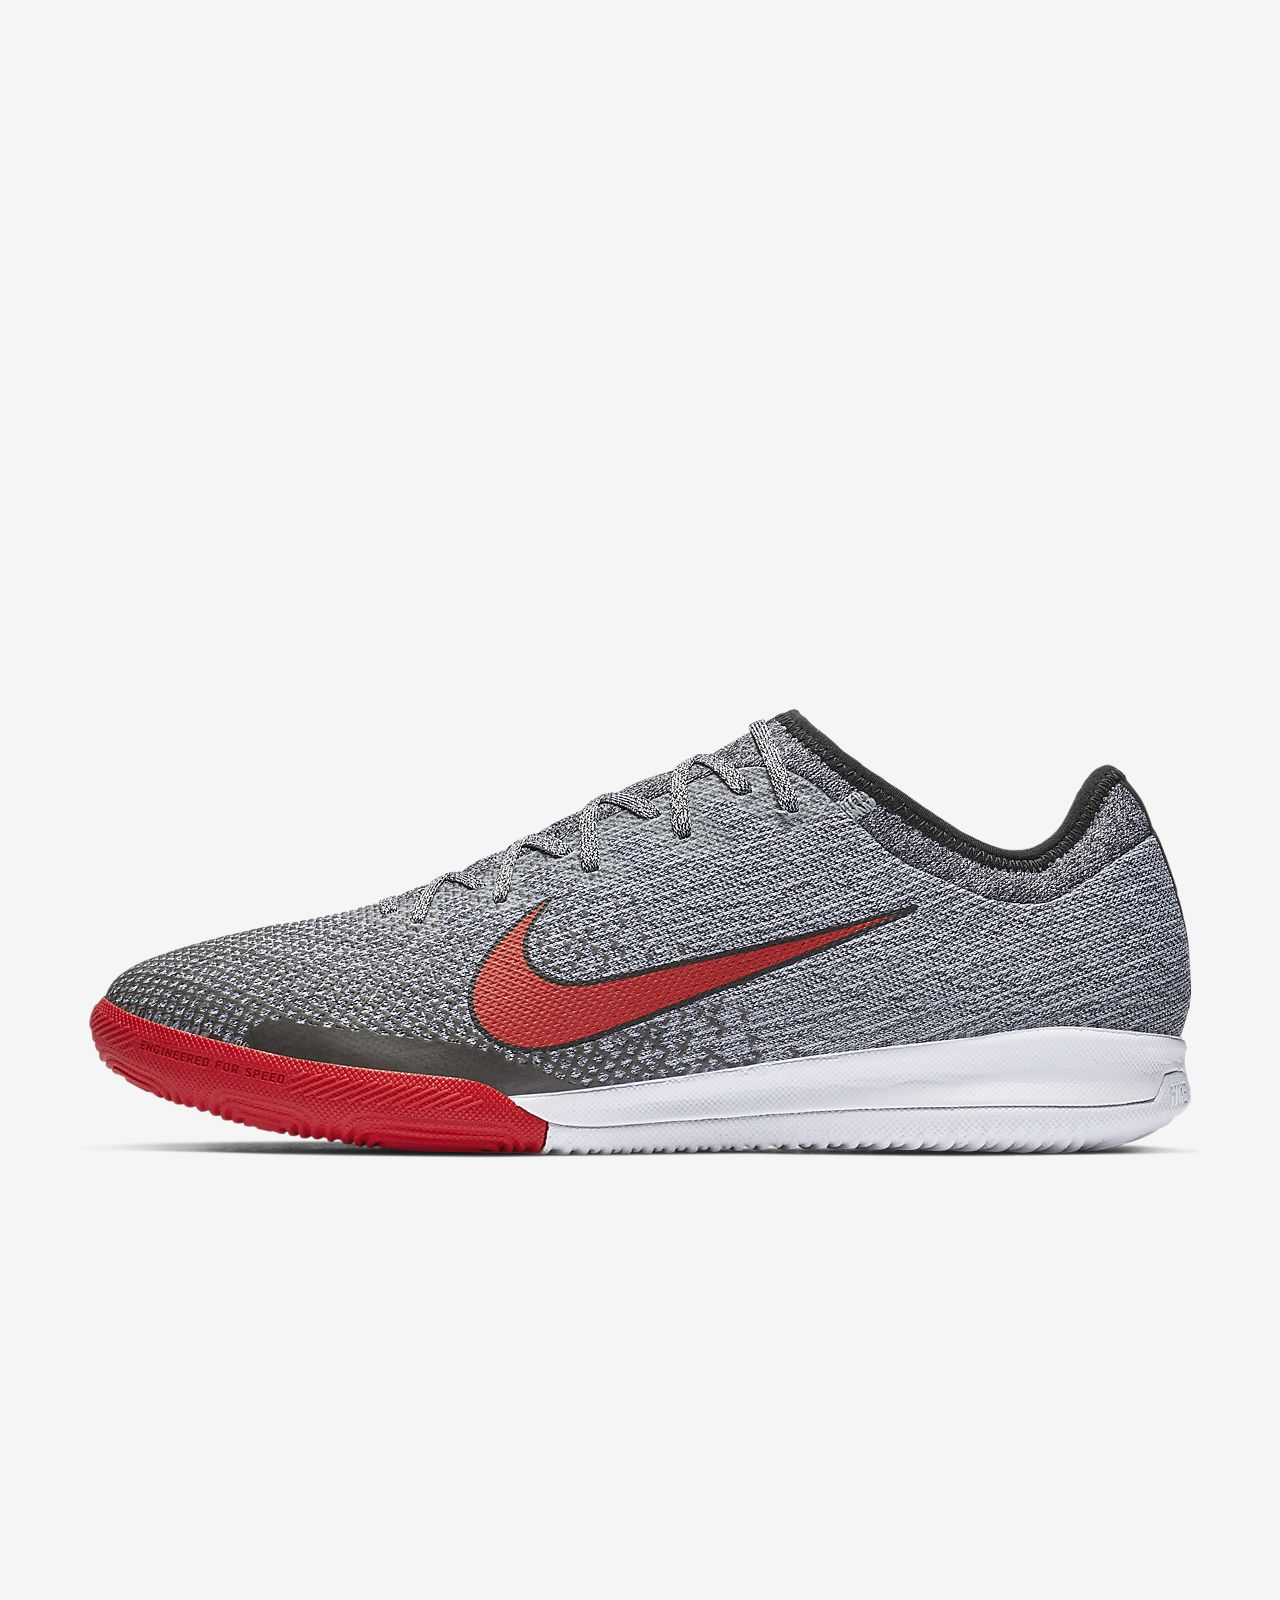 654cff7e230 Nike MercurialX Vapor XII Pro Neymar Indoor Court Football Shoe ...